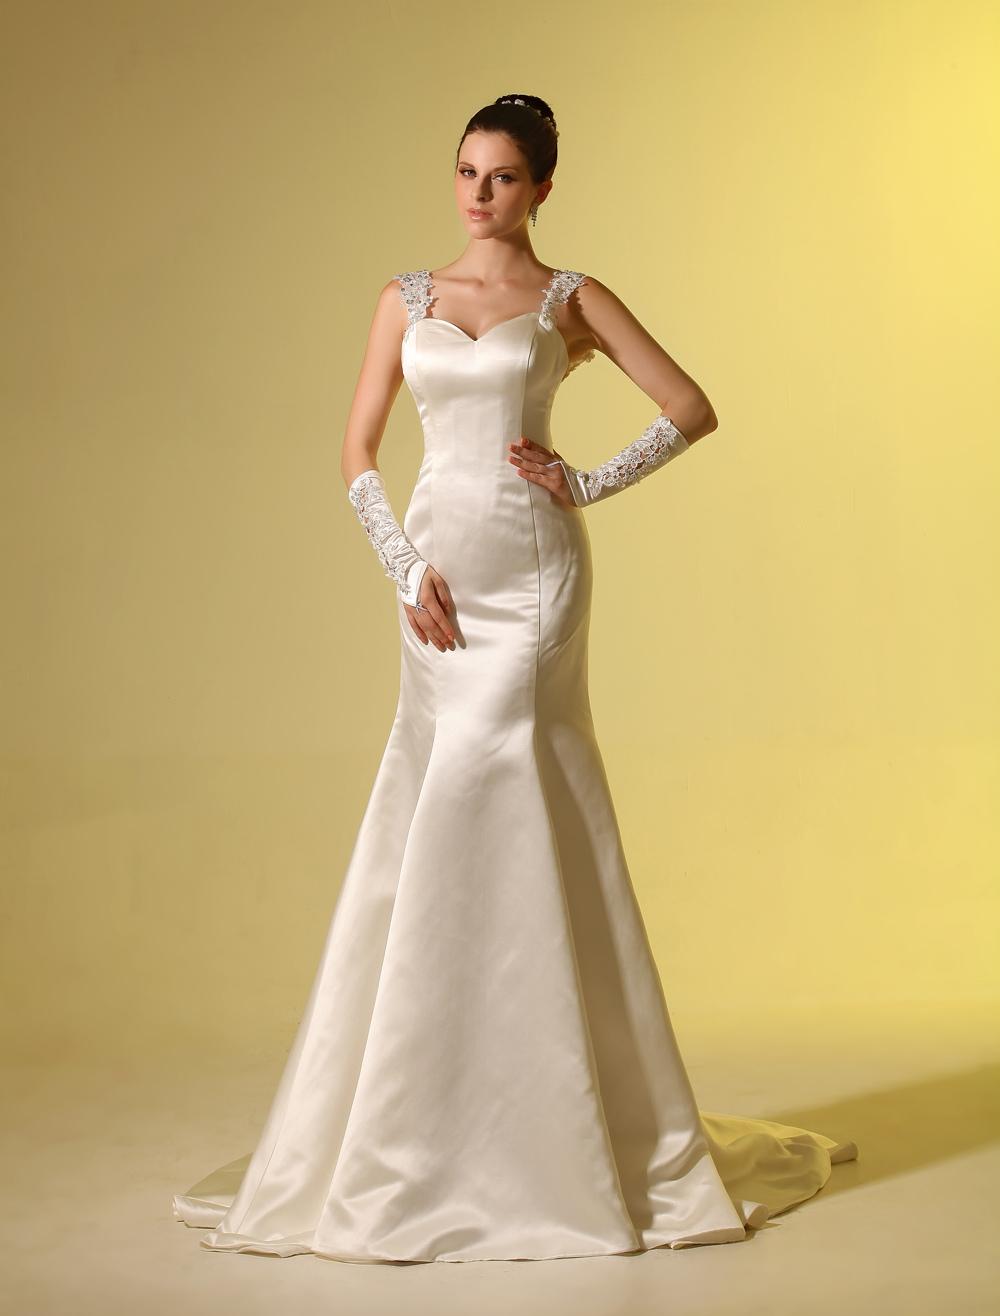 Sweetheart Mermaid Spaghetti Ivory Wedding Dress For Bride  Milanoo